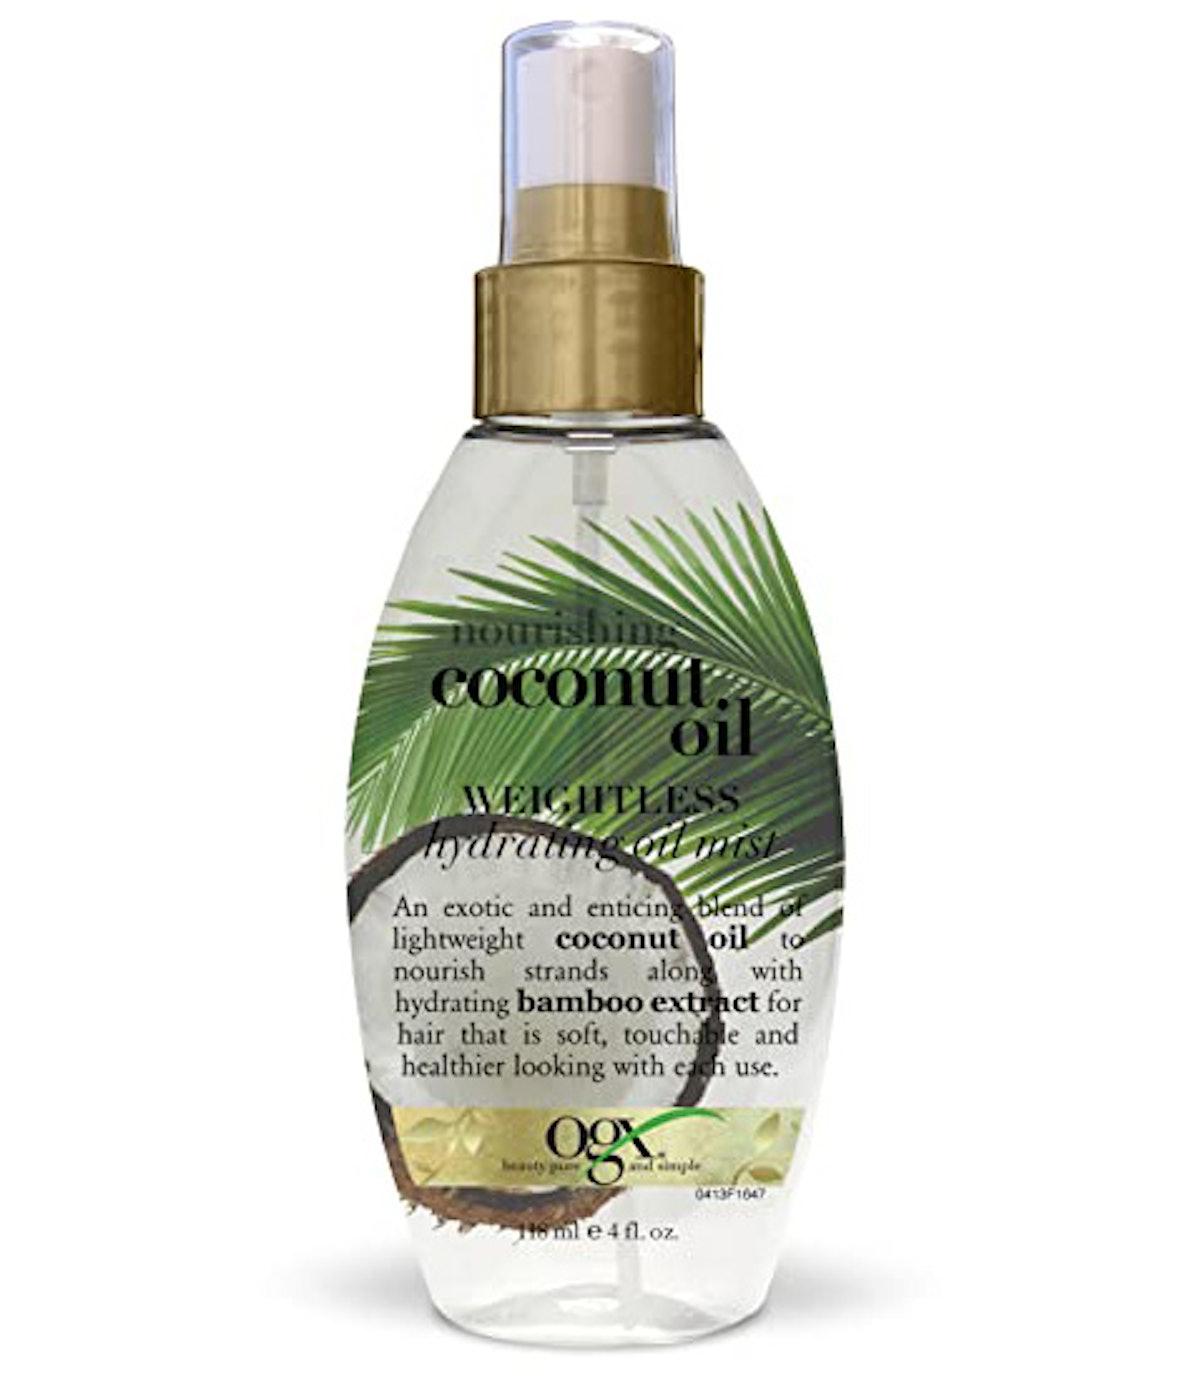 OGX Nourishing + Coconut Oil Weightless Hydrating Oil Hair Mist